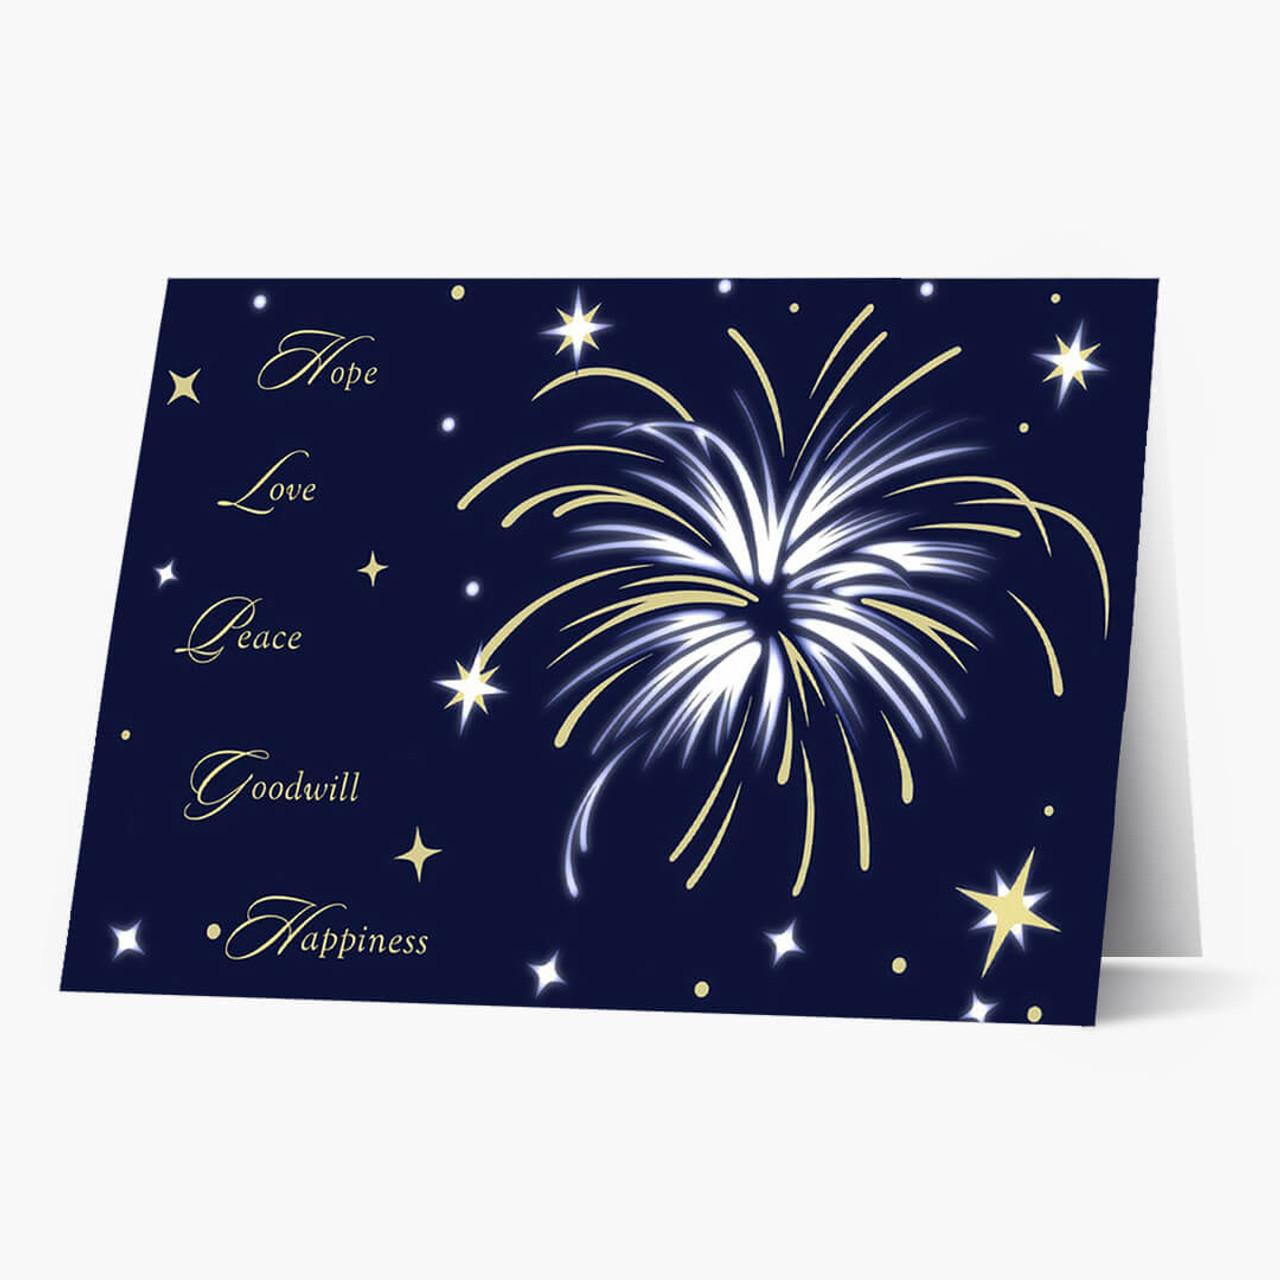 Bright Starburst Wishes Christmas Card